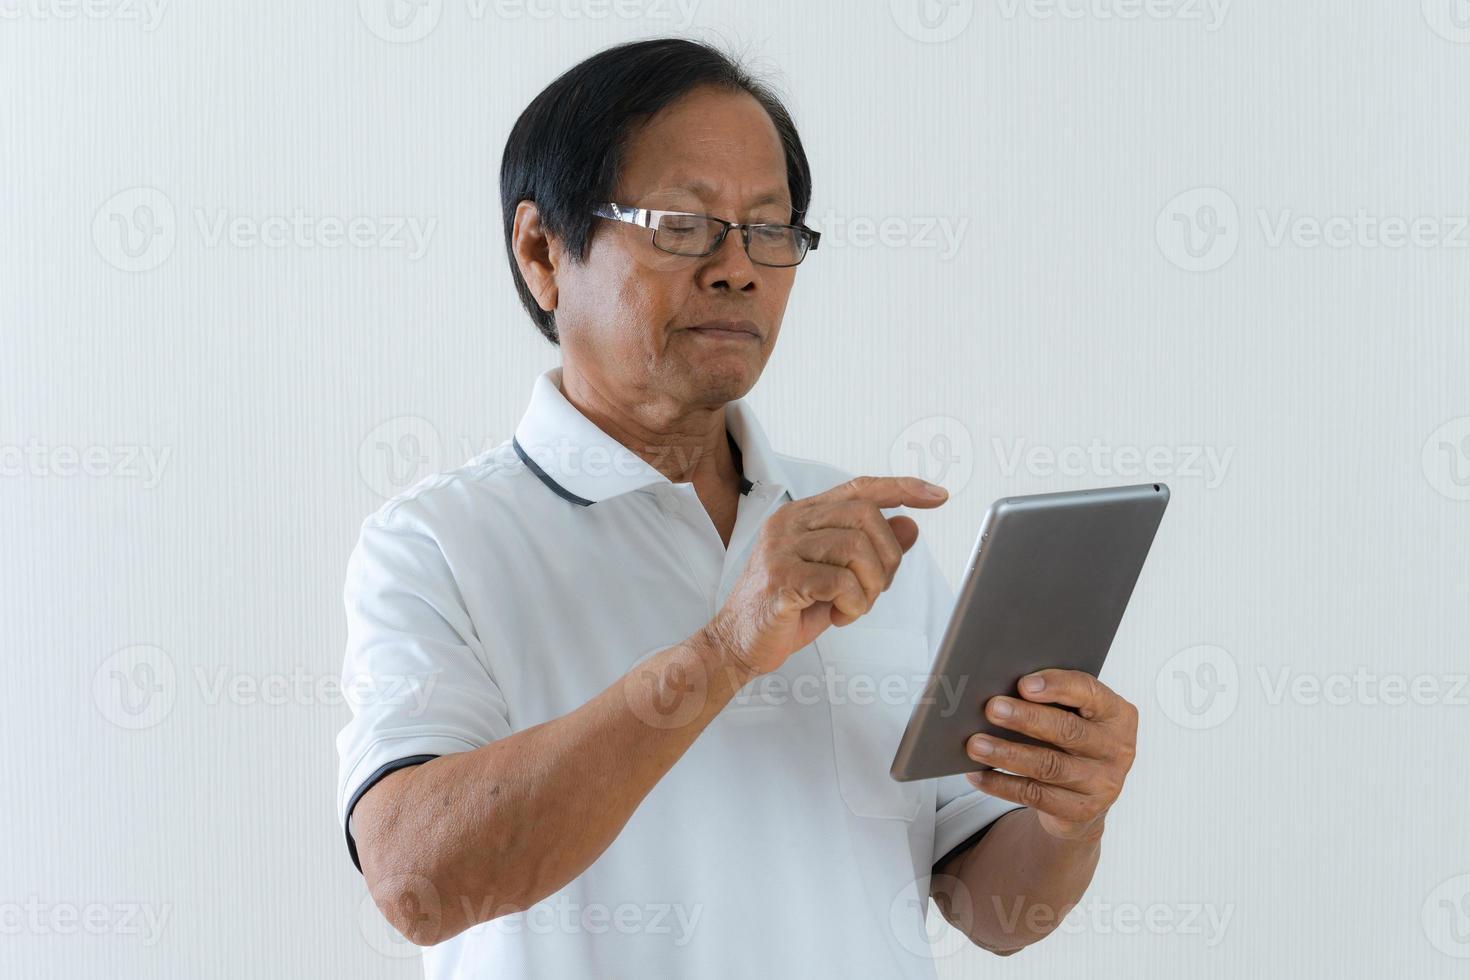 Portrait of Asian senior man using a digital tablet photo